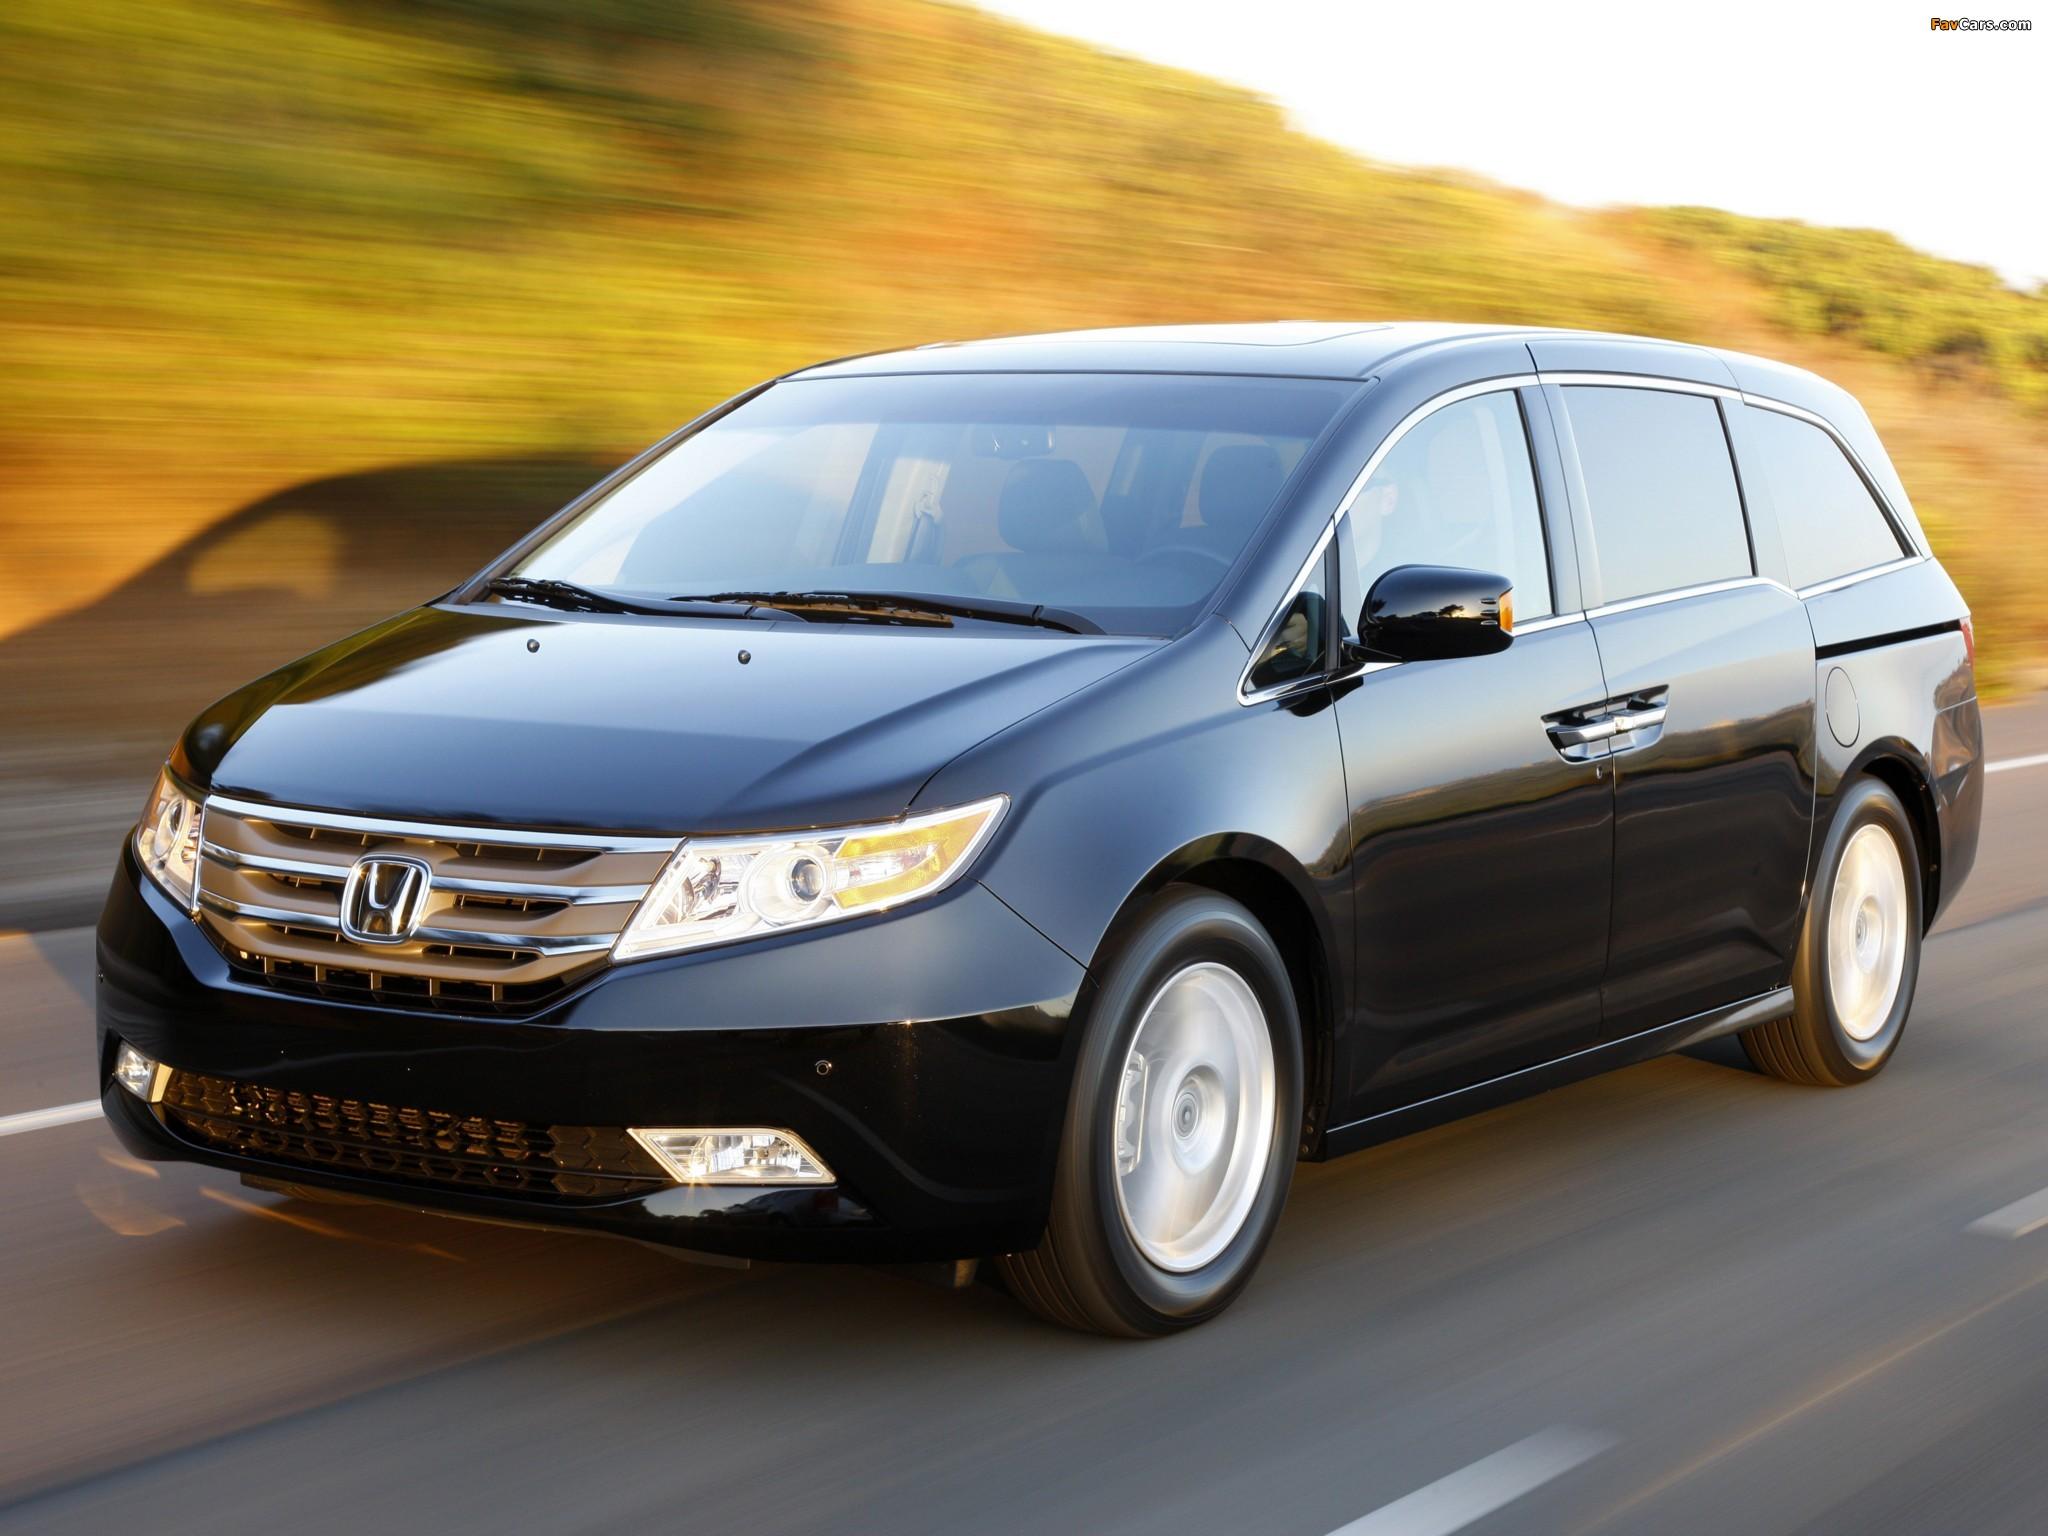 Honda Odyssey US-spec 2010 photos (2048x1536)